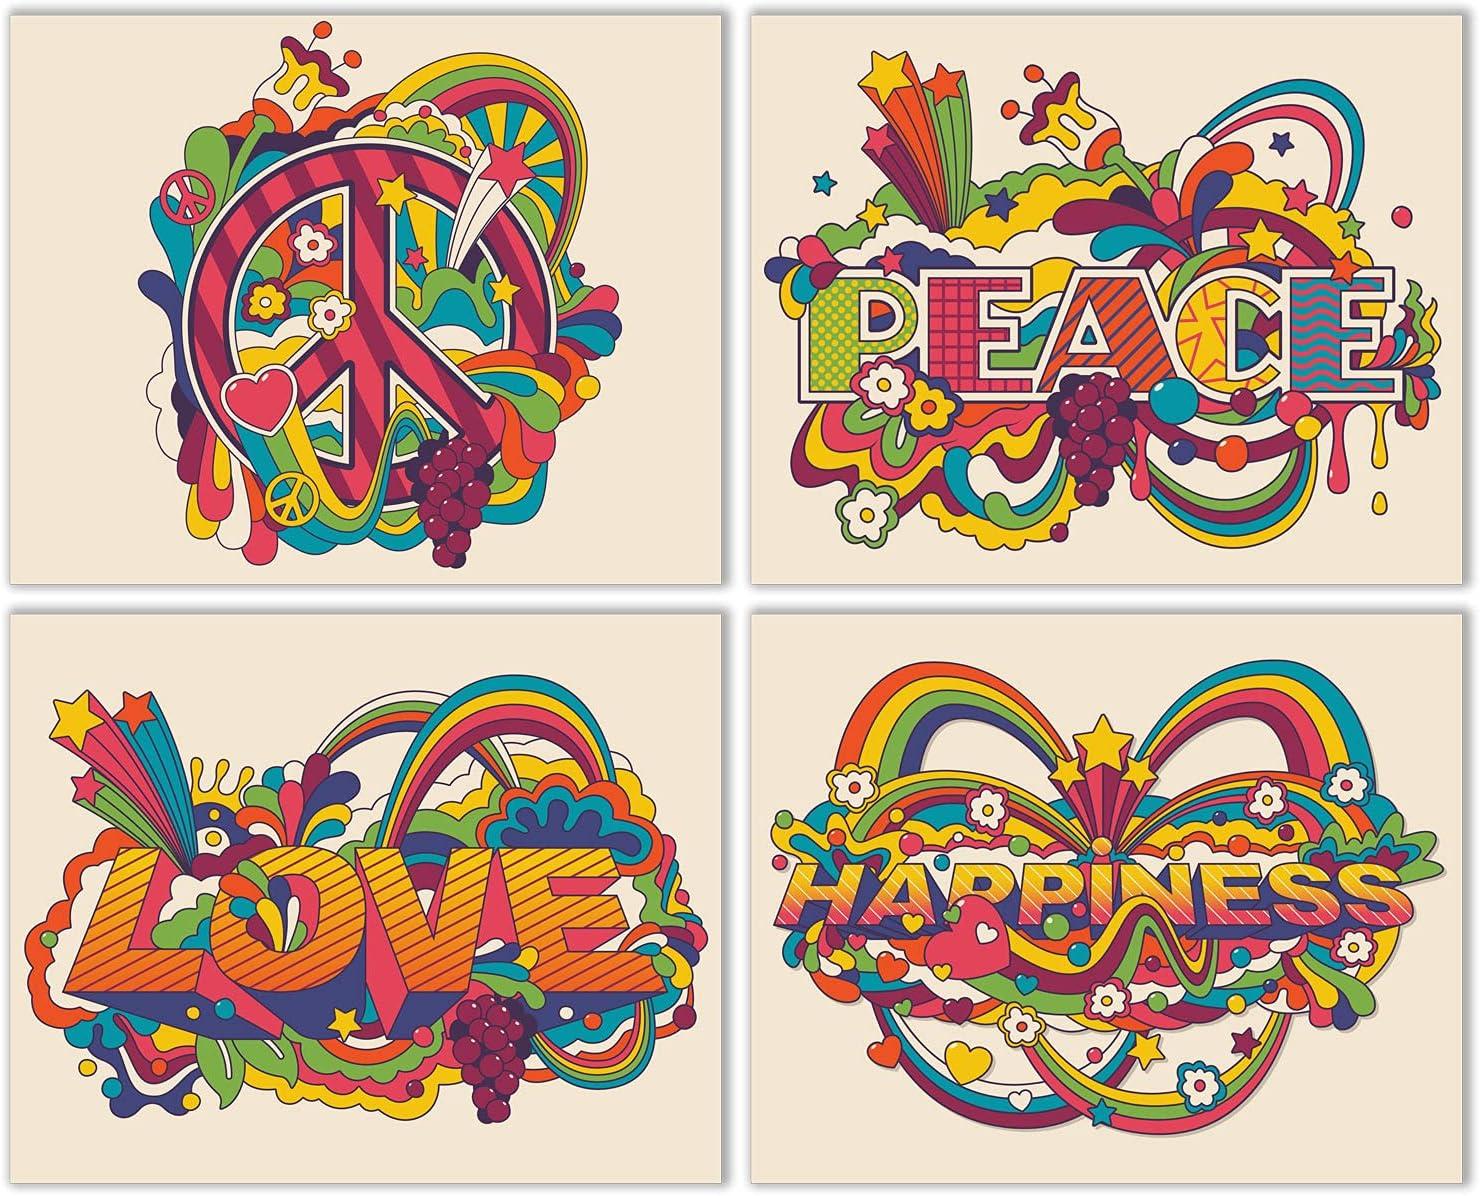 Summit Designs Hippie Love Peace Joy Wall Art Decor Prints - Set of 4 (8x10) Inch Unframed Poster Photos - Bedroom Dorm Girls Boys Gift Idea